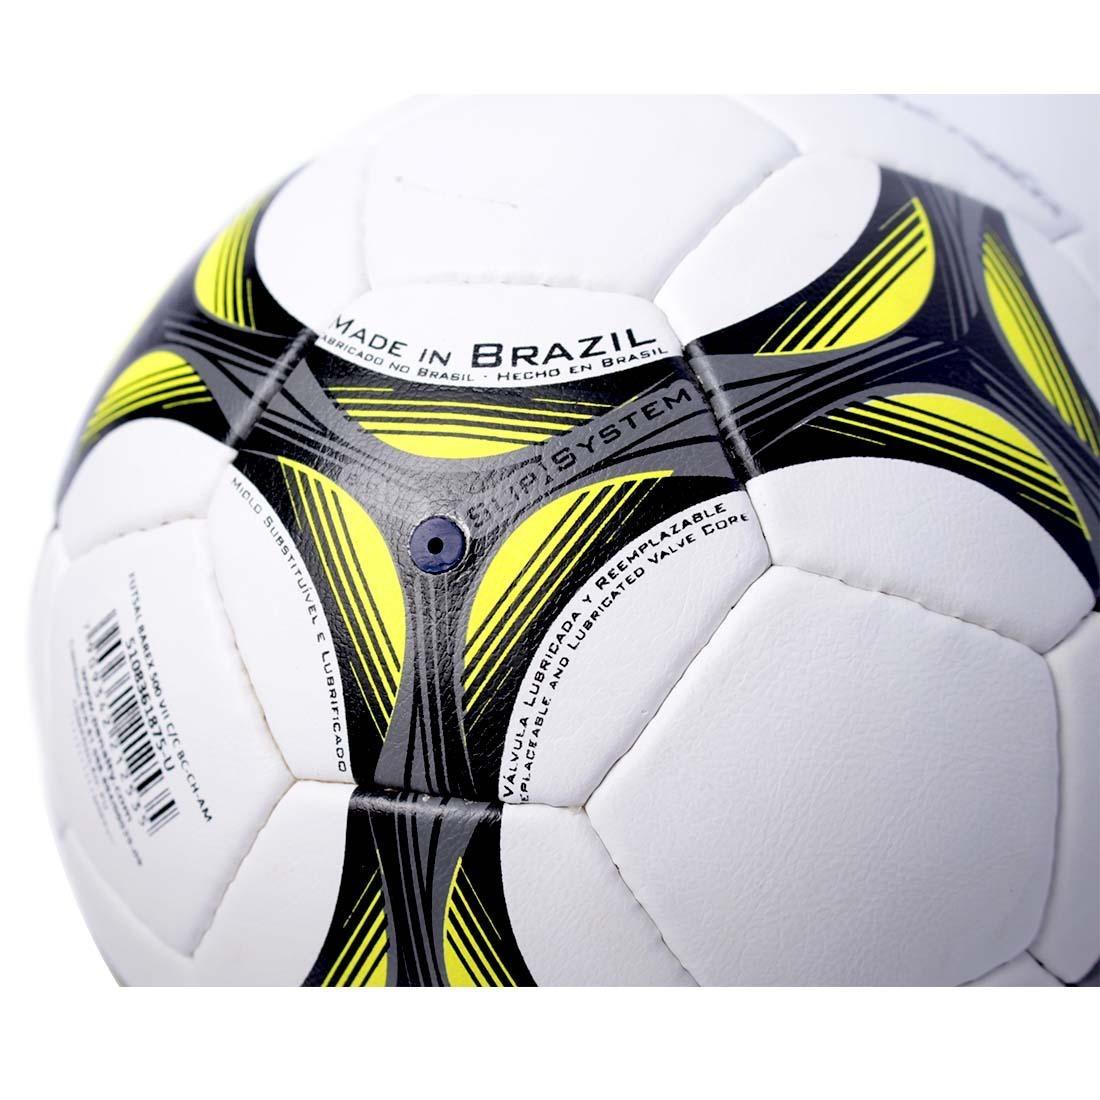 bola futsal penalty barex 500 vii costurada. Carregando zoom. d680e1ee0e6ab